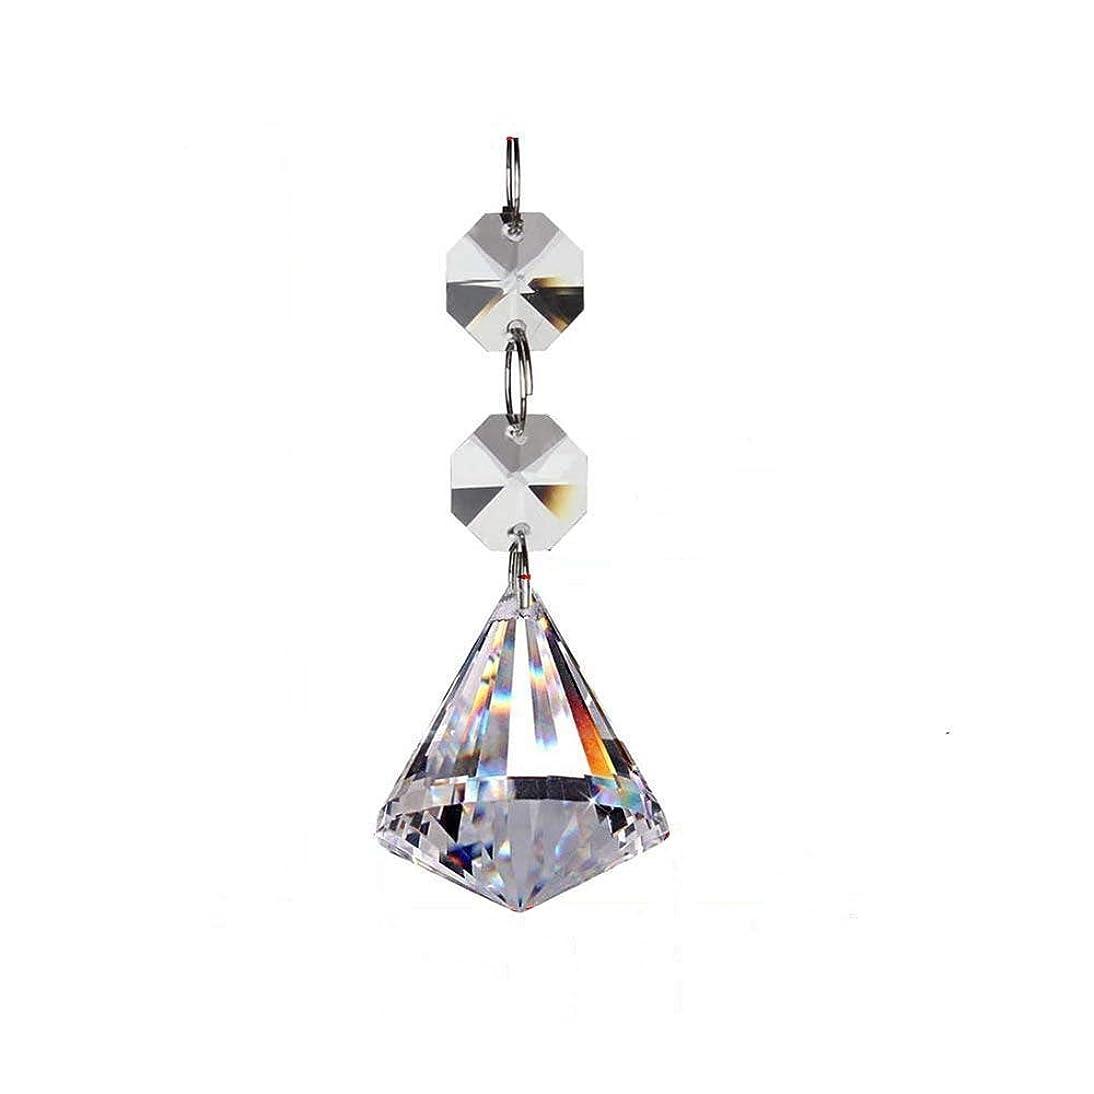 Camybb 10PCS Crystal AAA Chandelier Prisms Pendants Balls Suncatchers Crystal Garland Beads (30mm)